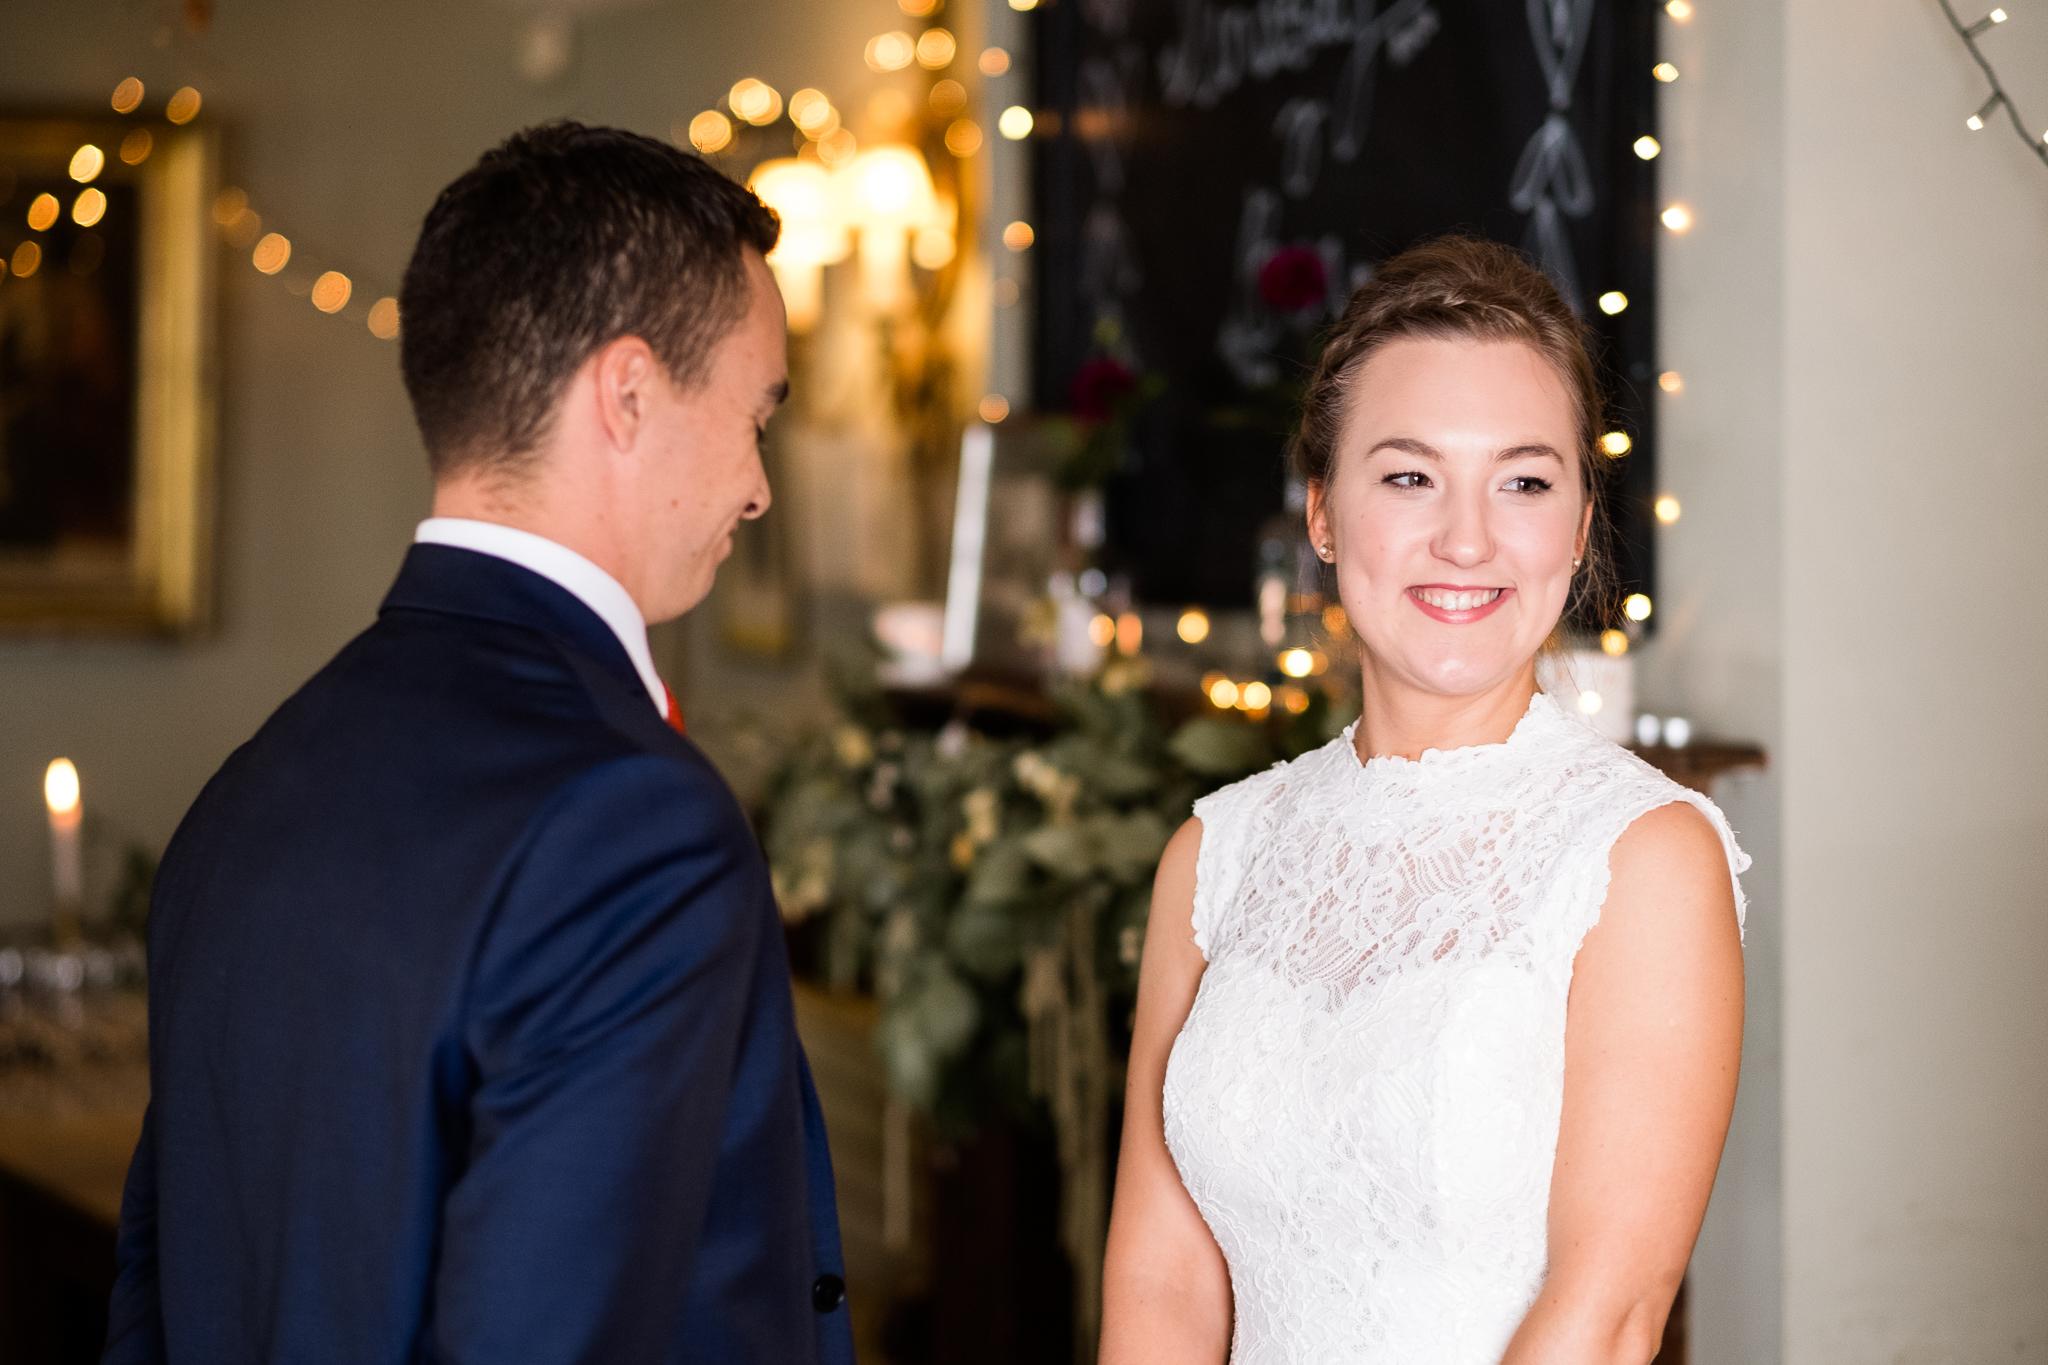 Relaxed Documentary Wedding Photography at The Wizard Inn, Alderley Edge Cheshire - Jenny Harper-27.jpg